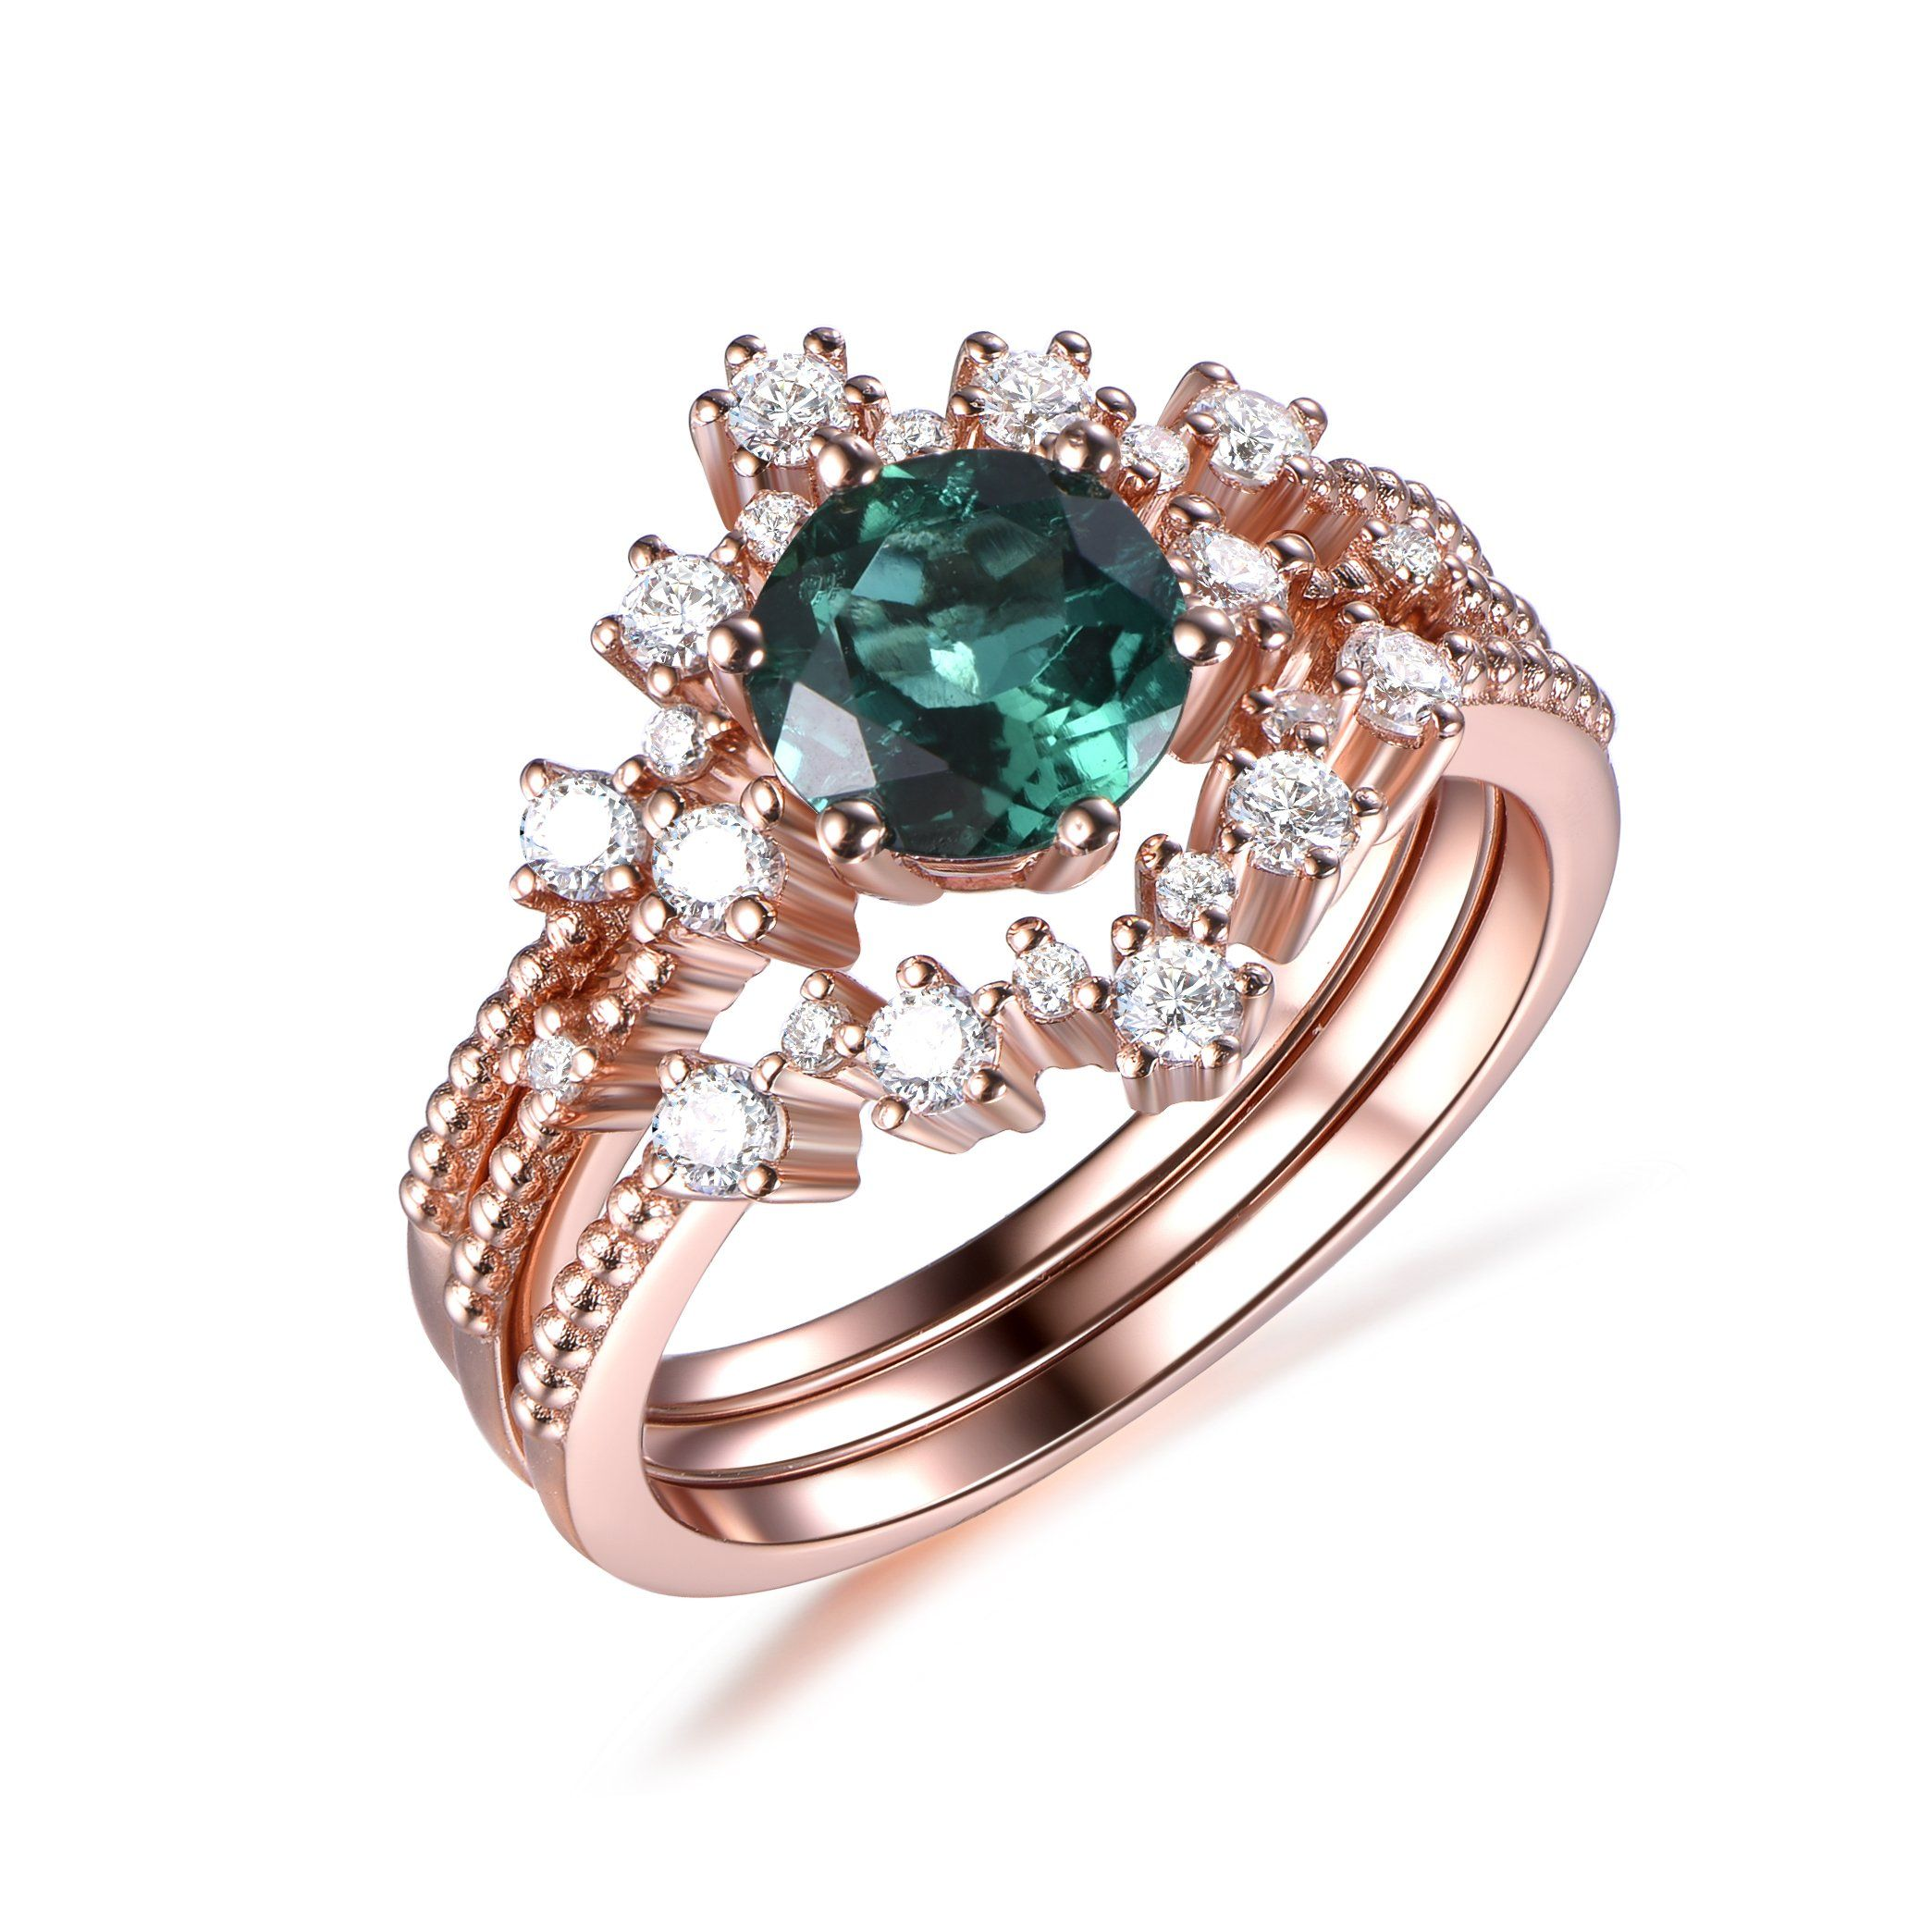 Round Emerald Engagement Ring Trio Bridal Sets Tiara Curve Diamond Wedding Band 14k Rose Gold 6.5mm - 6 / 14K White Gold